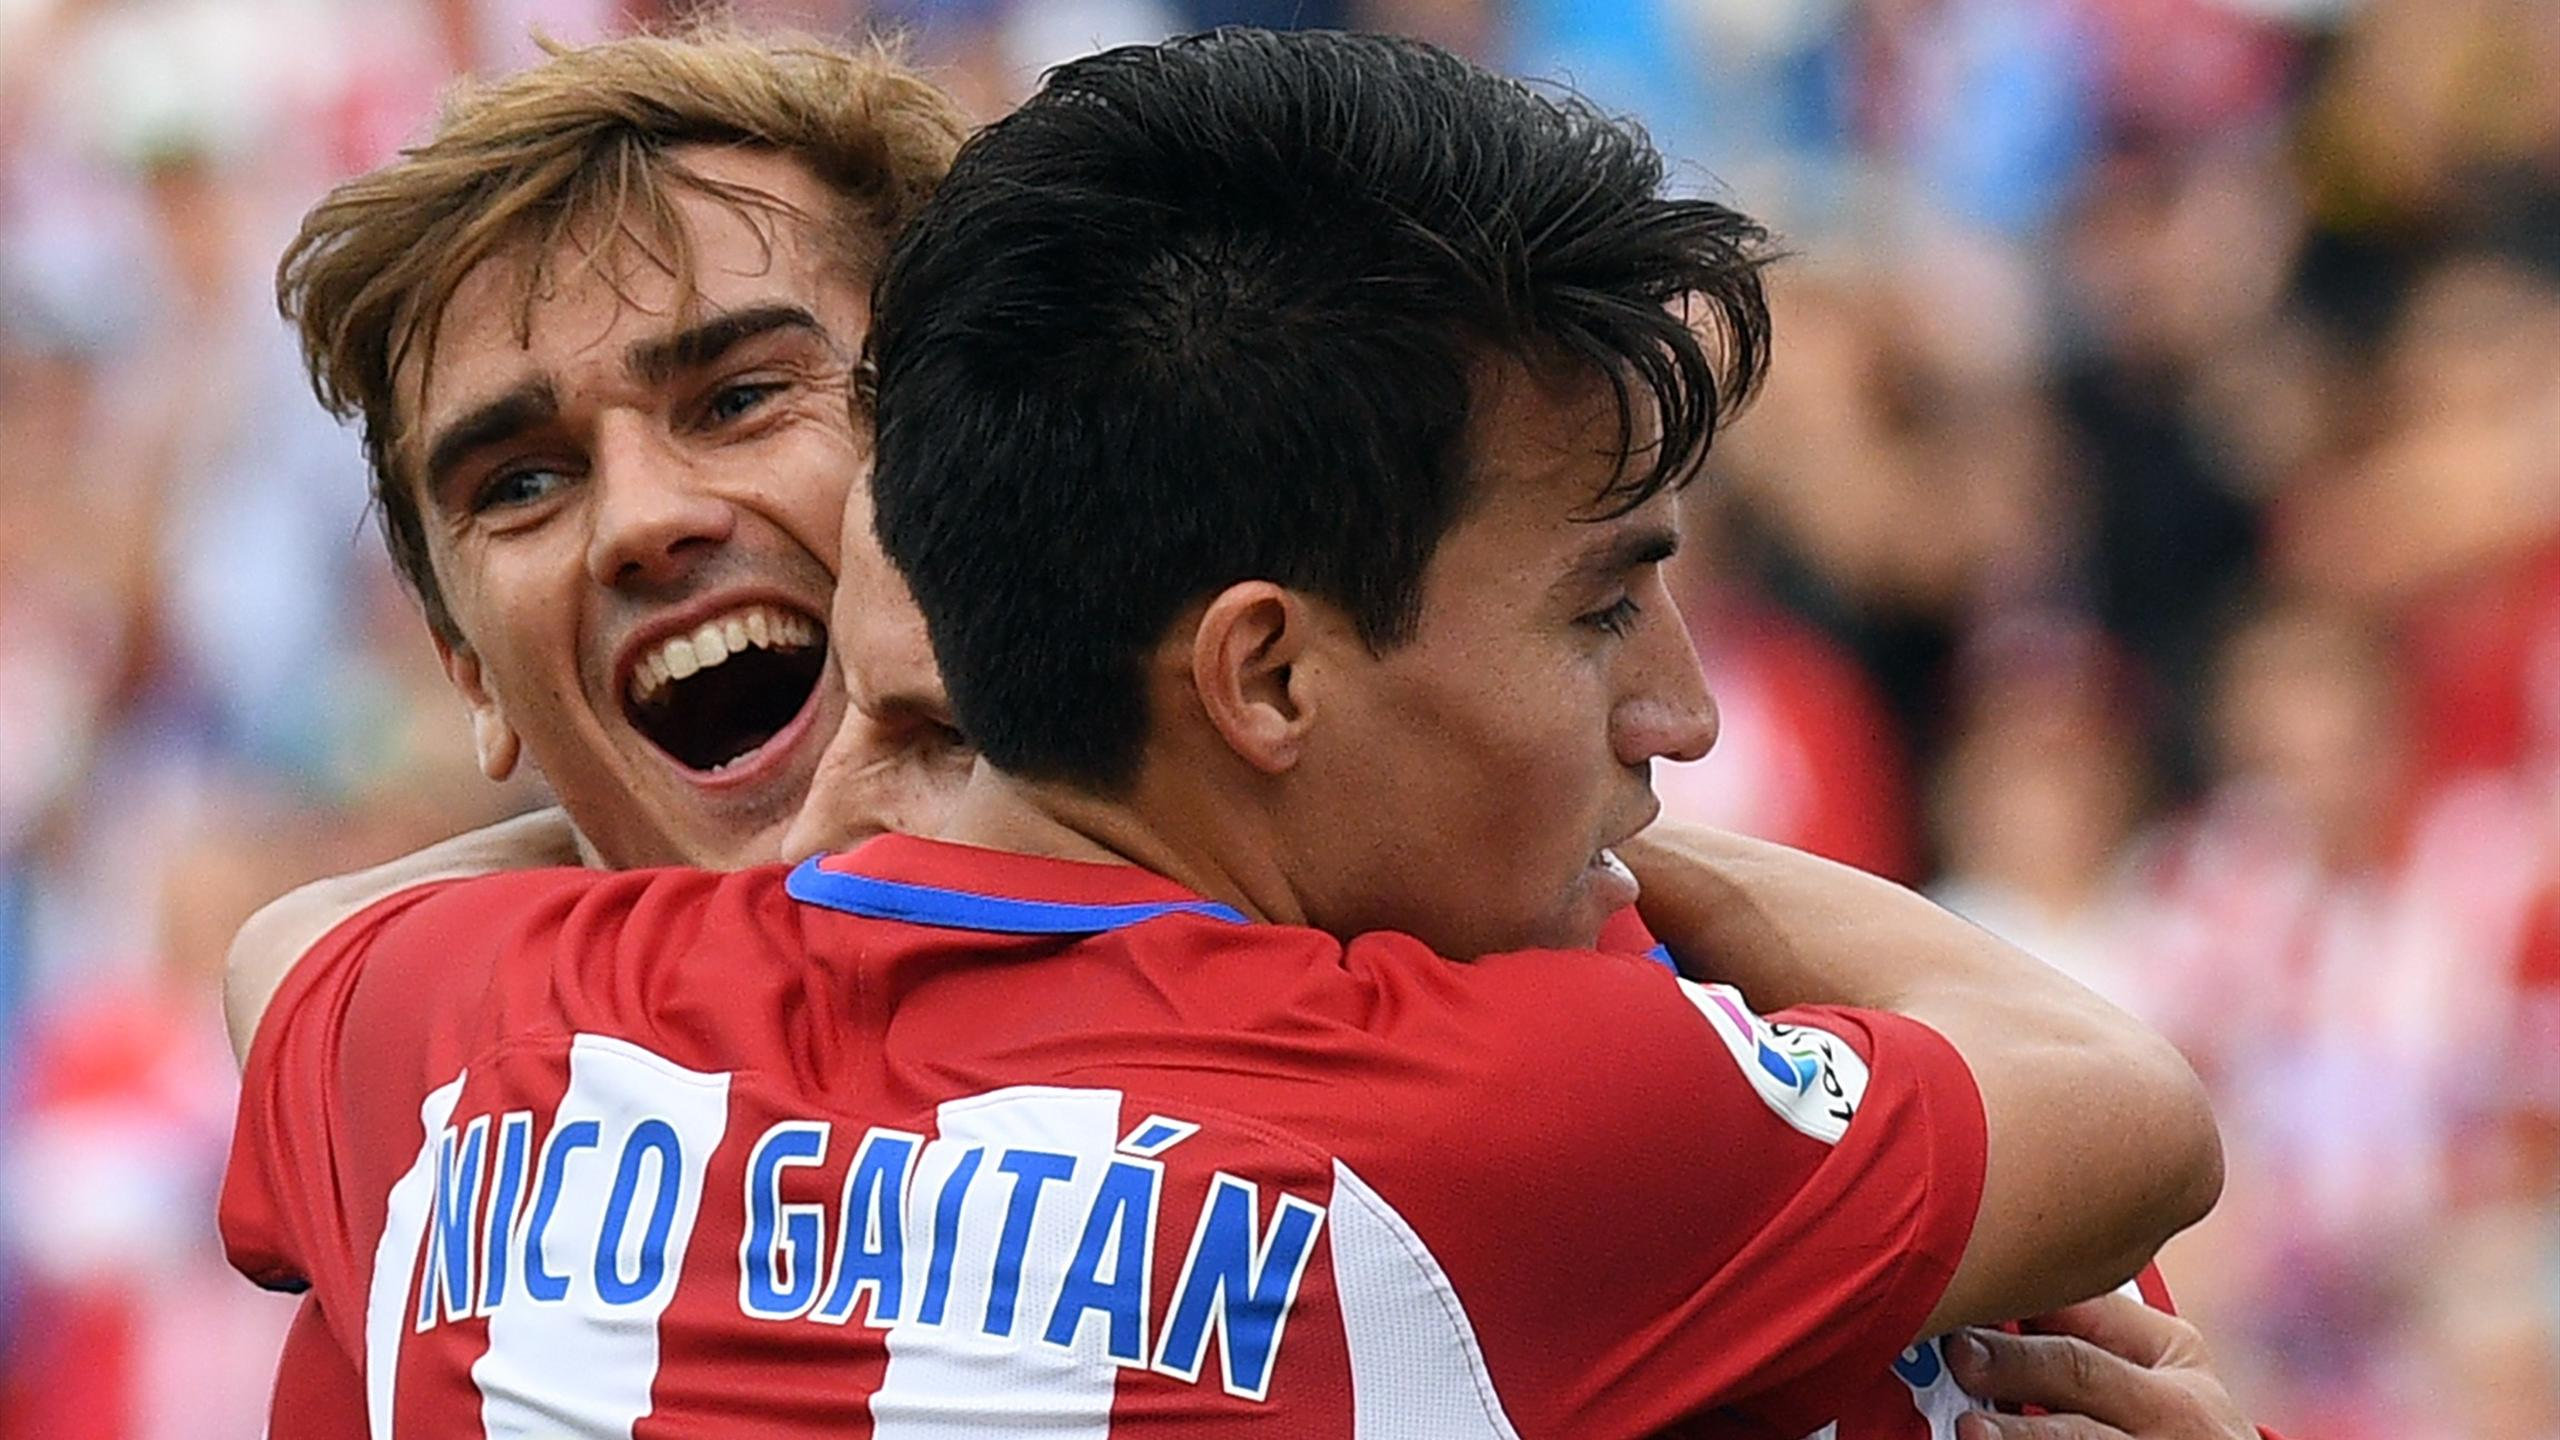 Antoine Griezmann et Nicolas Gaitan (Atletico Madrid)